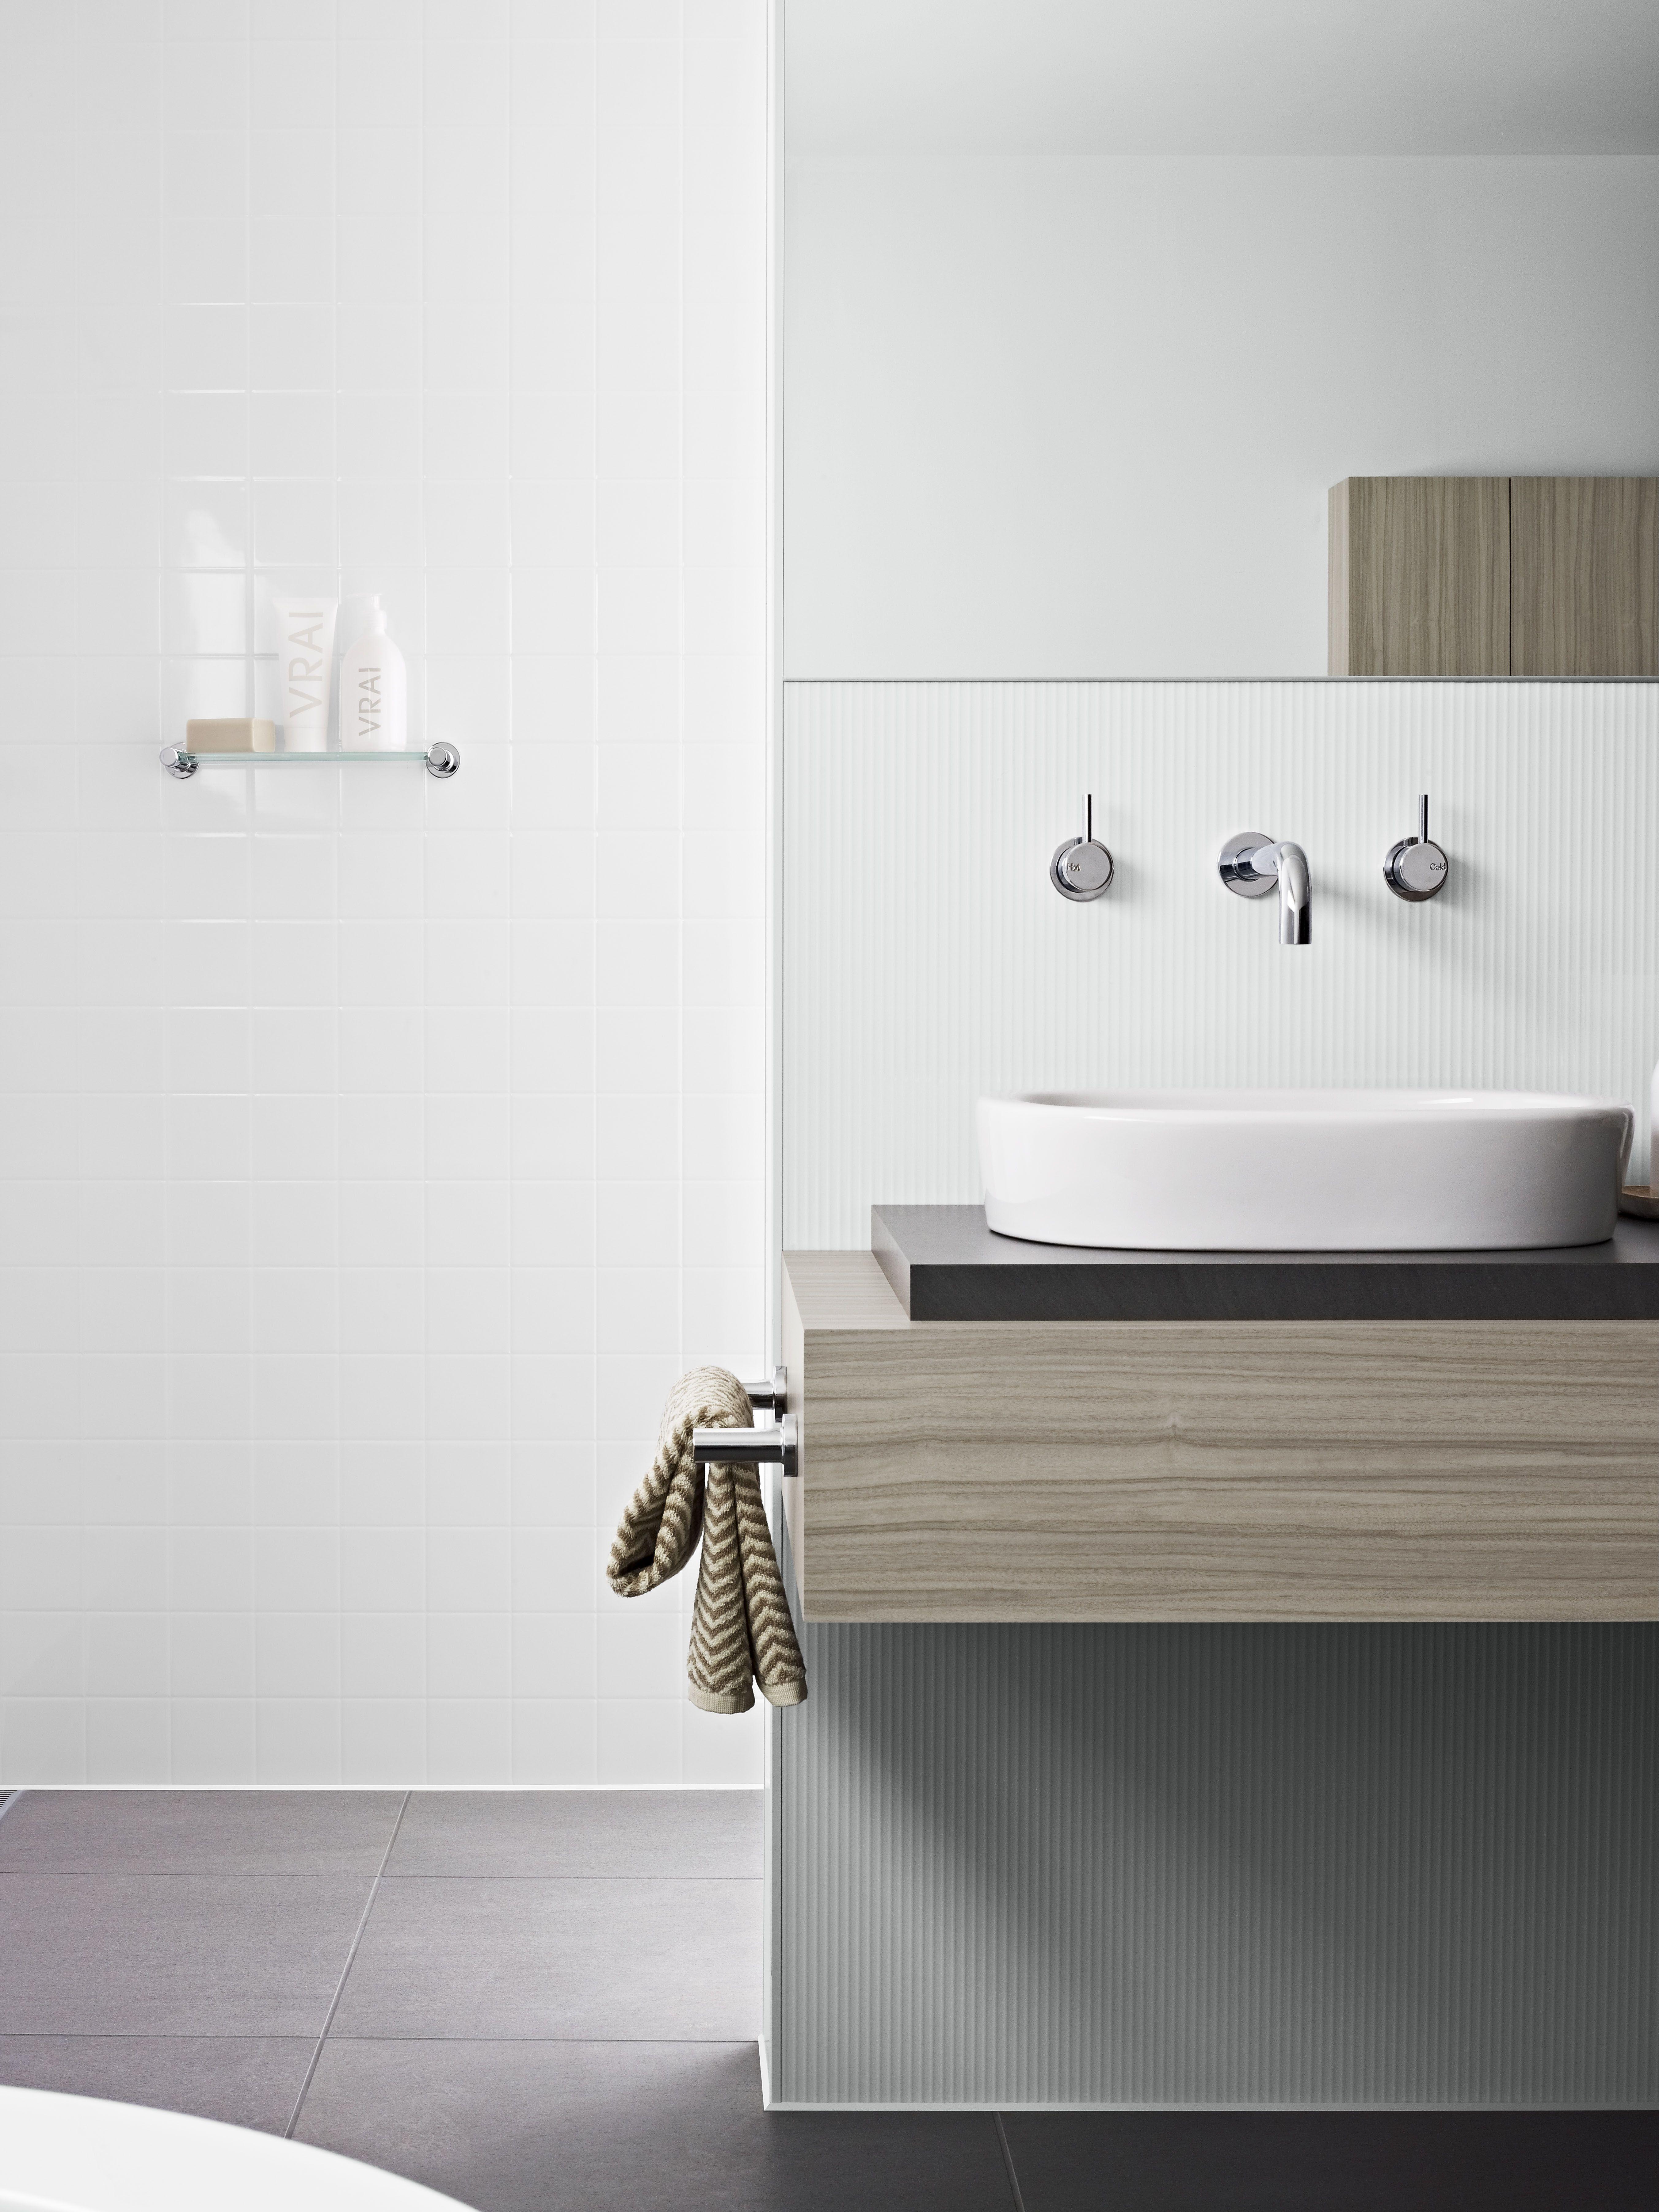 Back Wall And Shower Panelling Laminex Aquapanel Polar White Large Tile Basin Wall Laminex Bathroom Design Inspiration Shower Panels Bathroom Design